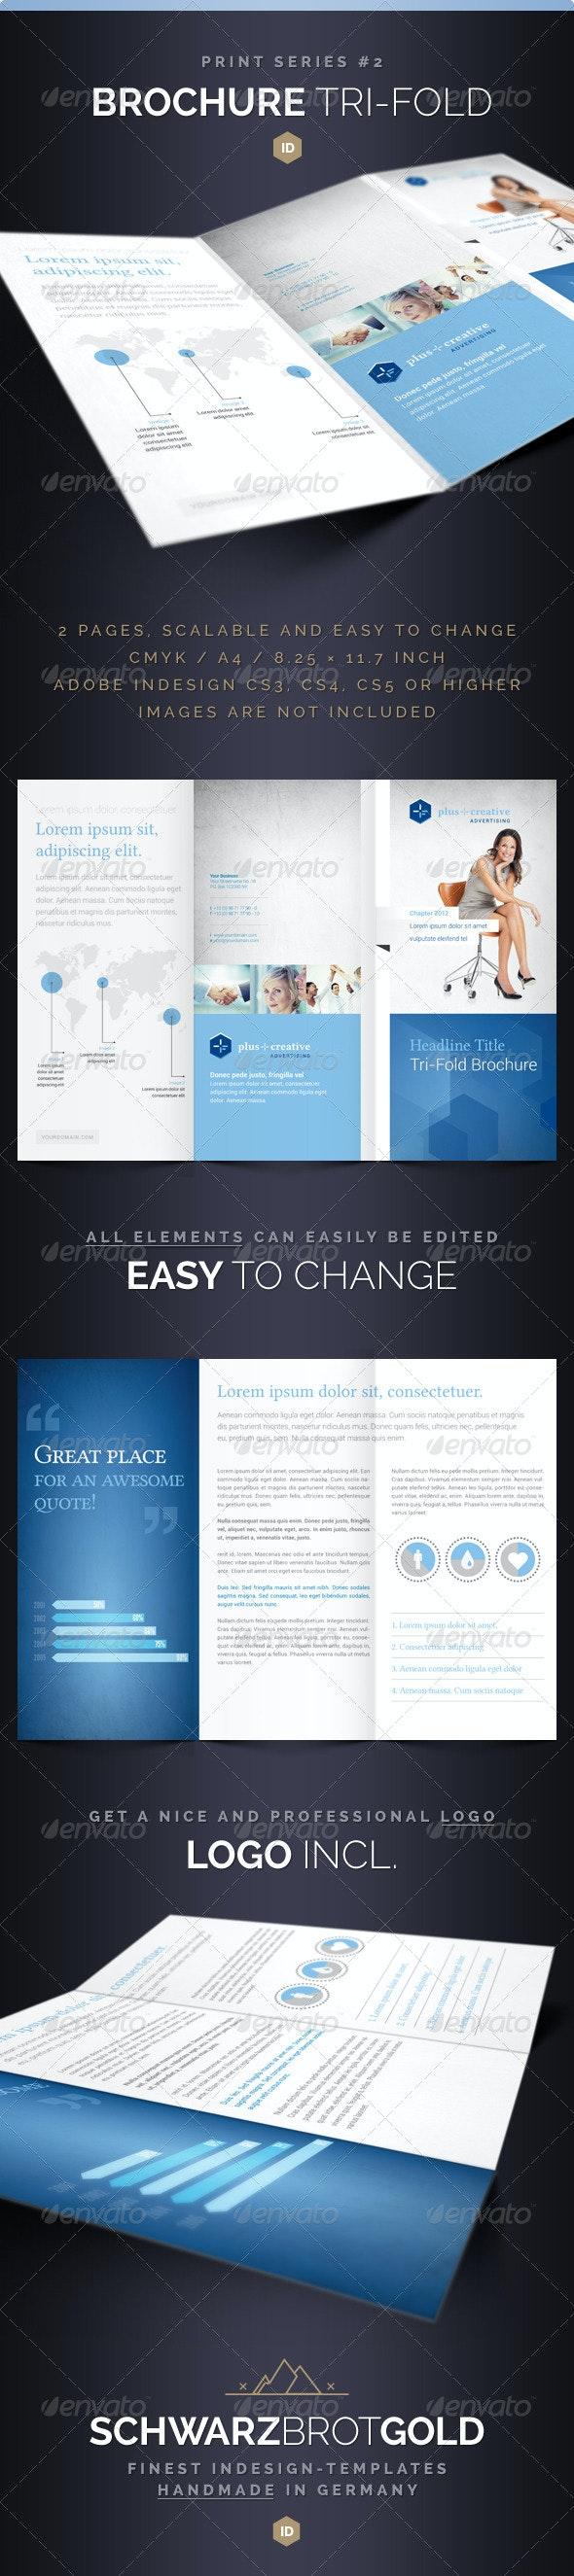 Brochure Tri-Fold DIN long Series 2 - Corporate Brochures